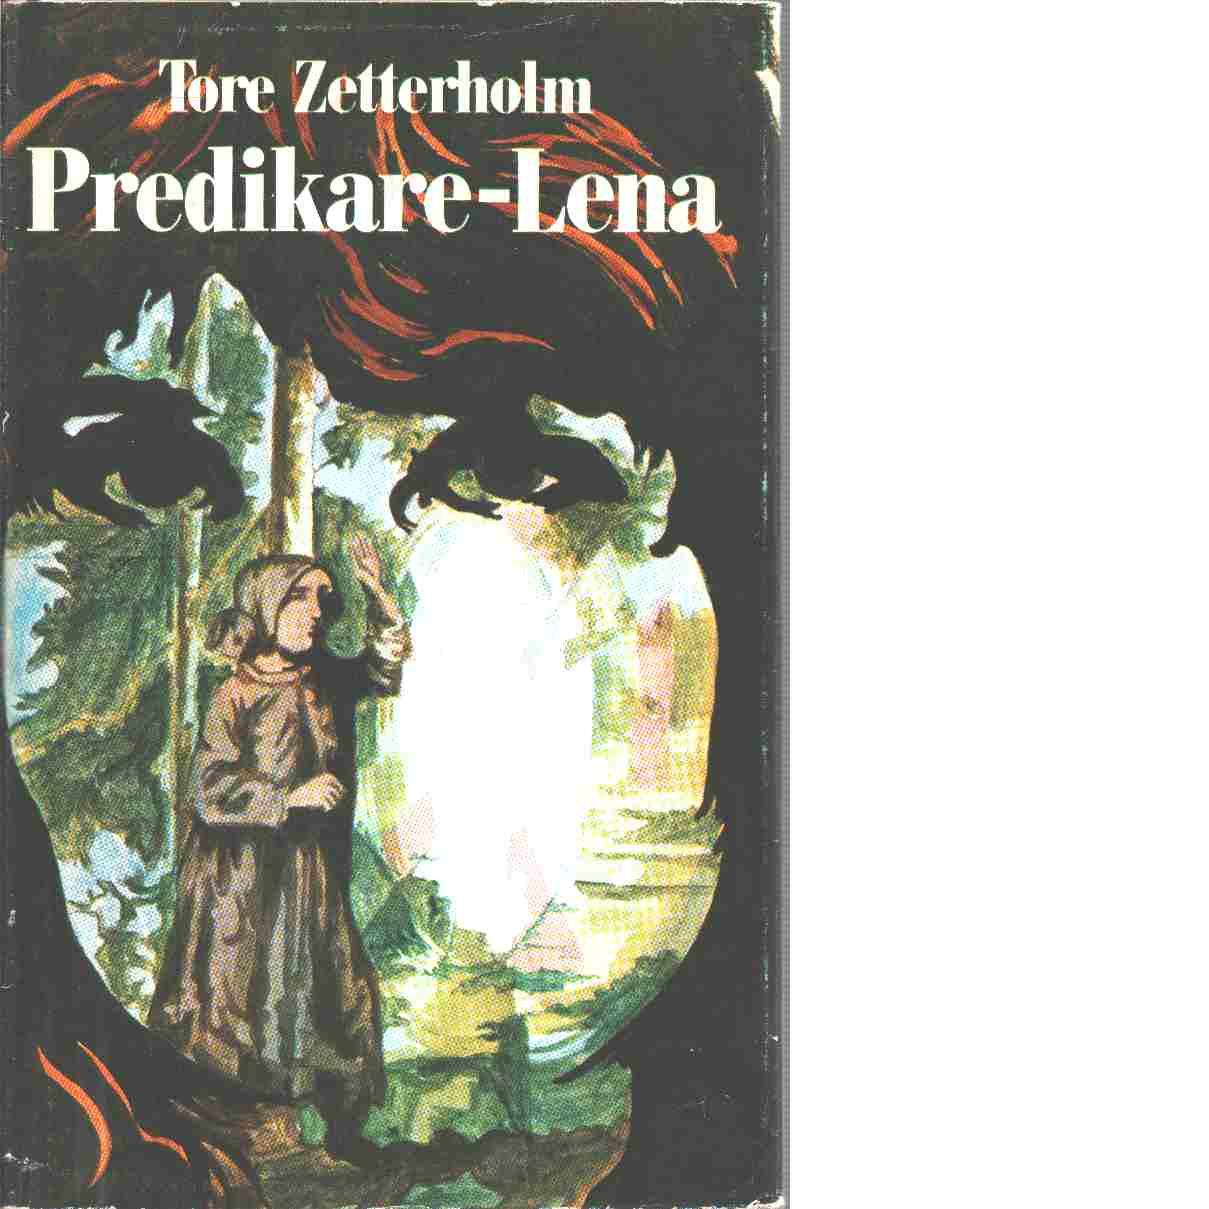 Predikare-Lena - Zetterholm, Tore